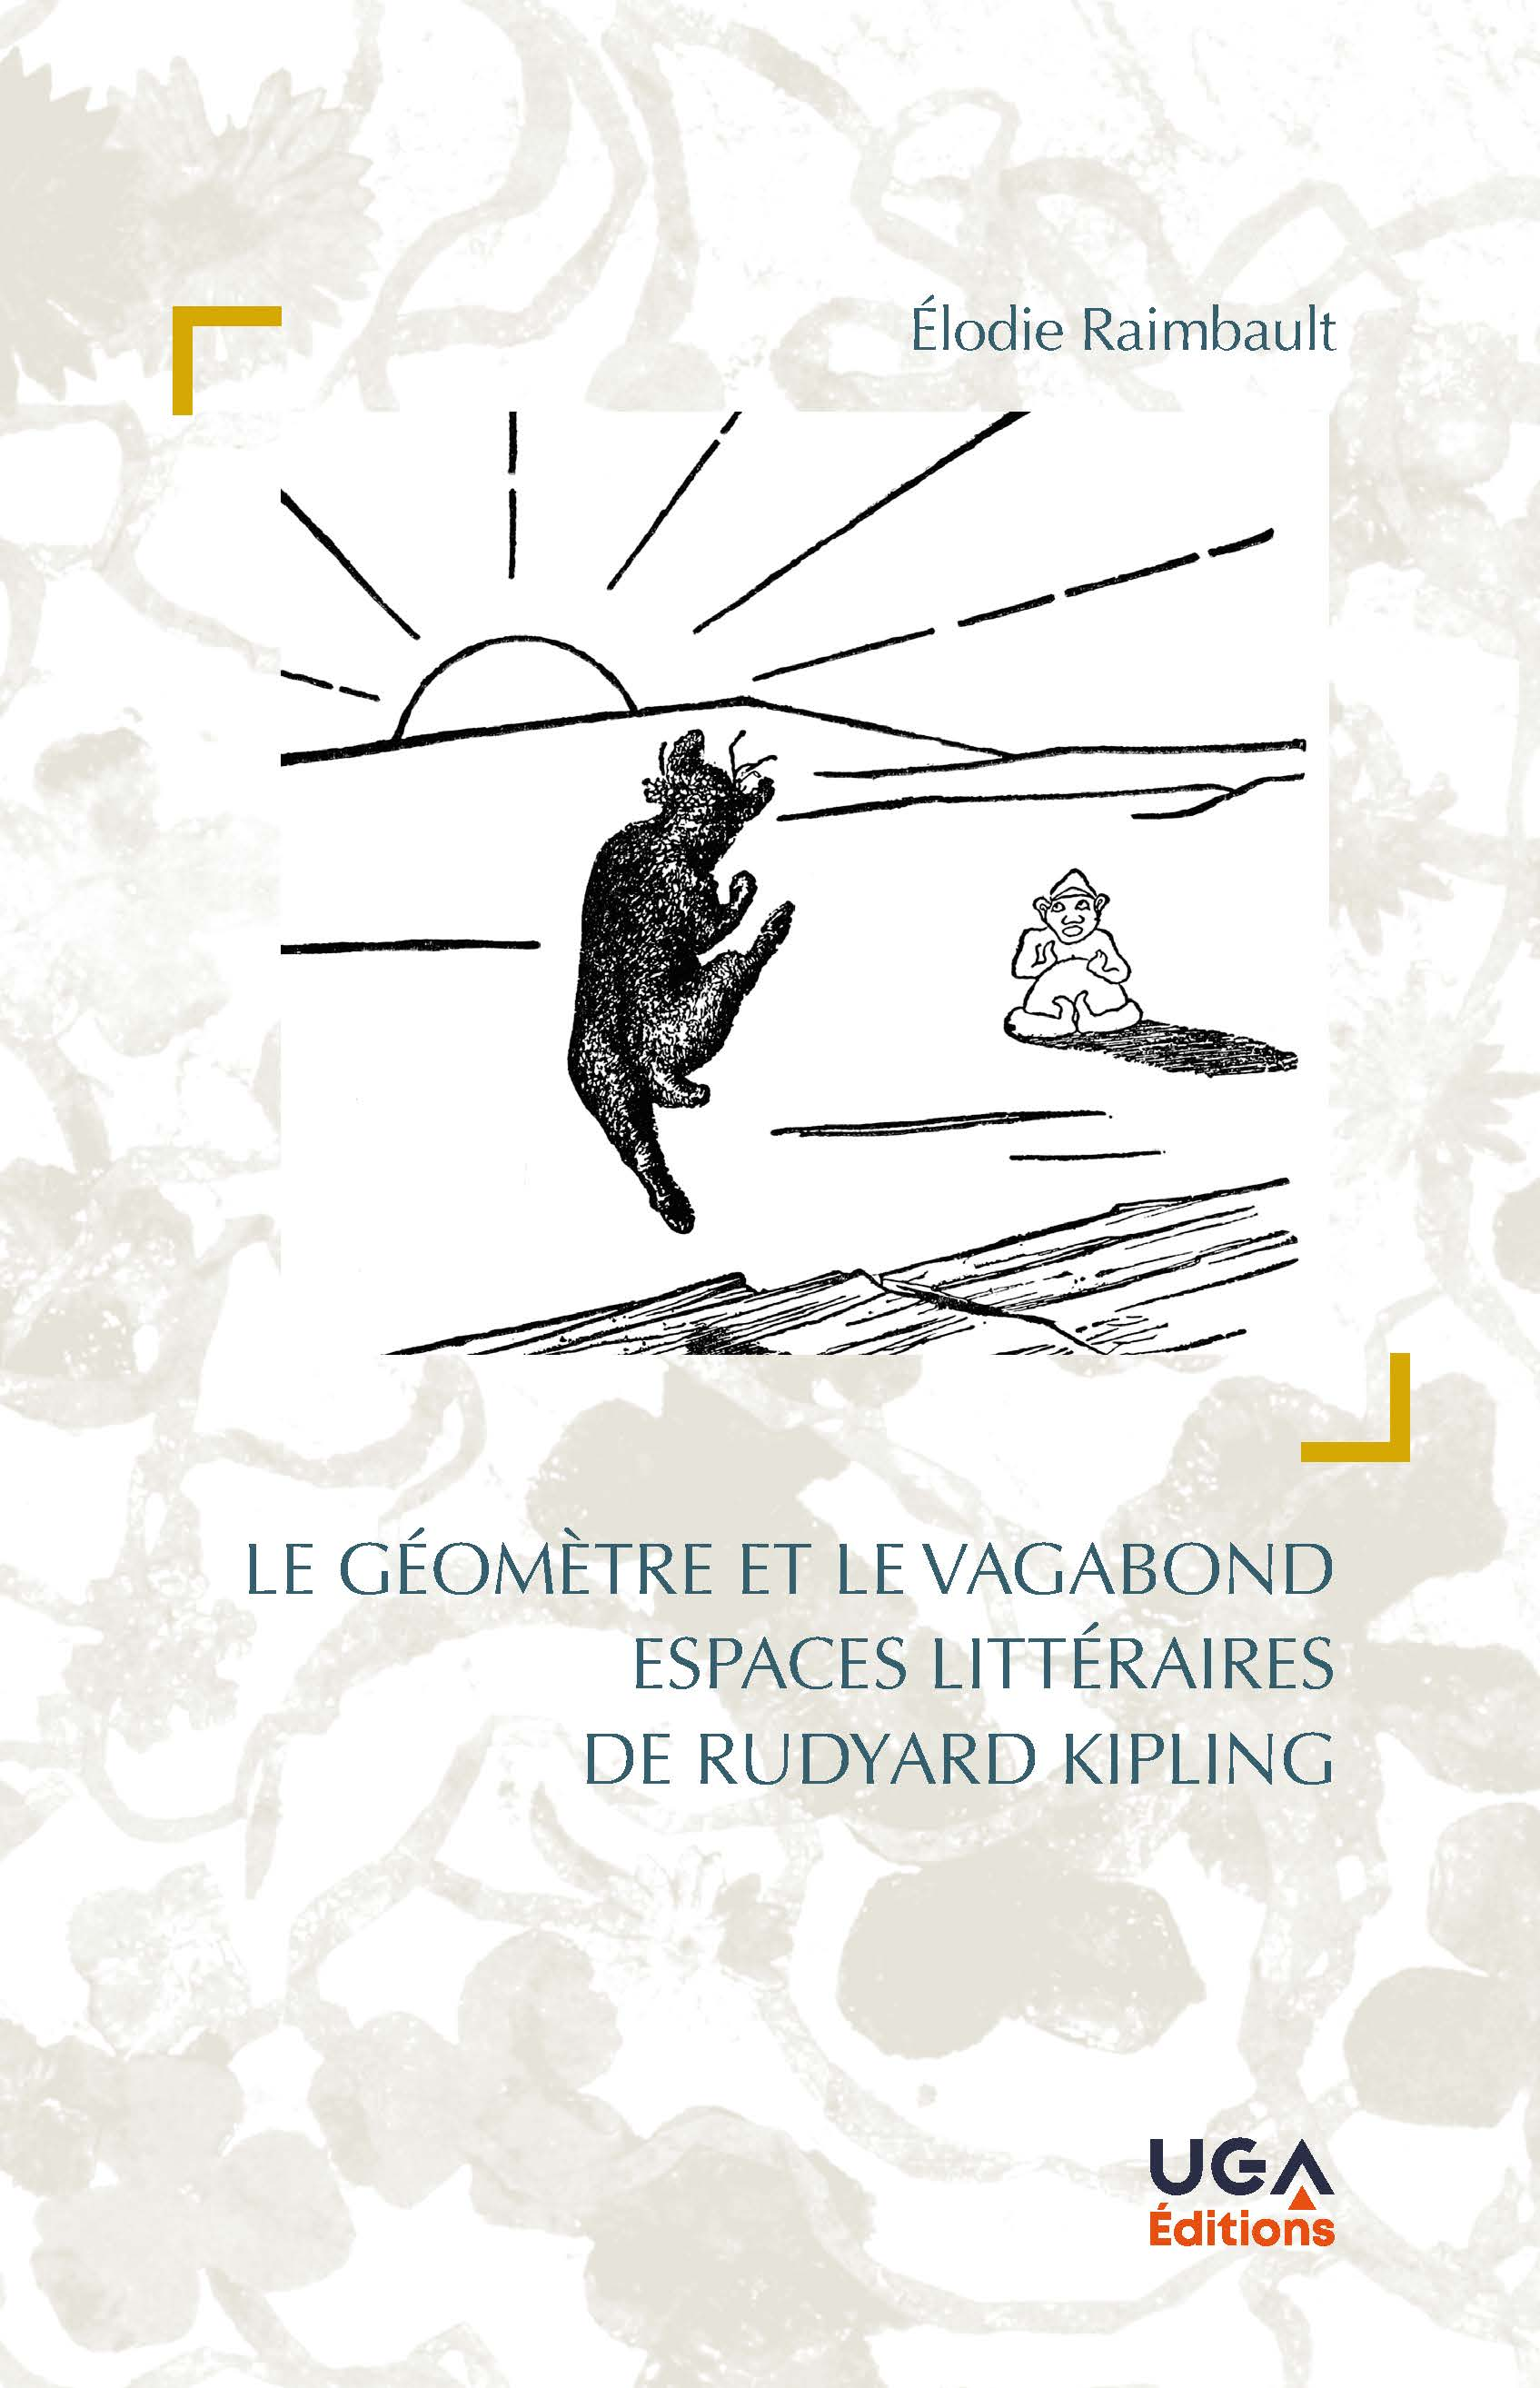 Espaces littéraires de Rudyard Kipling